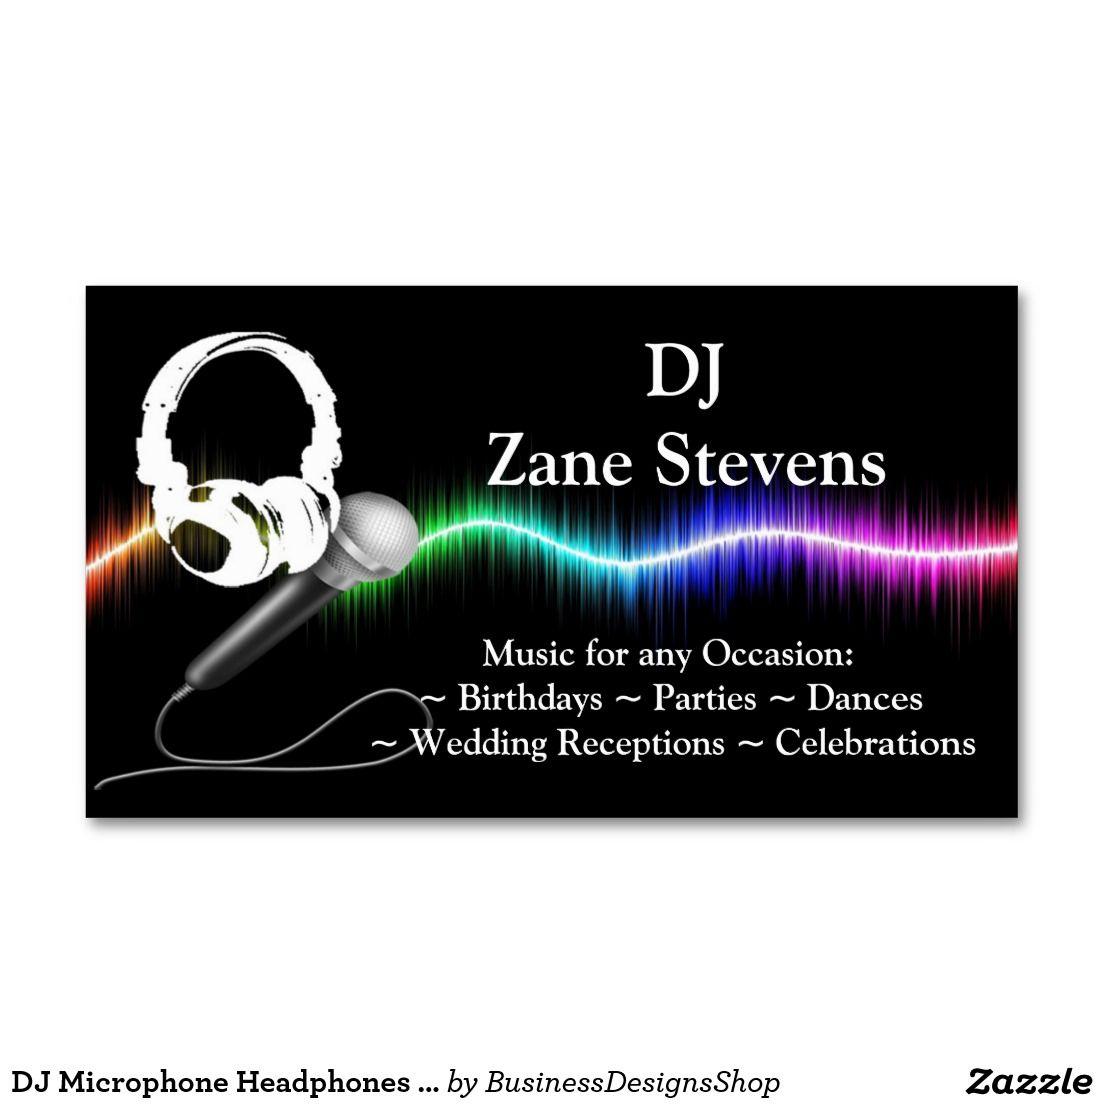 DJ Microphone Headphones Business Card Template | Card templates ...